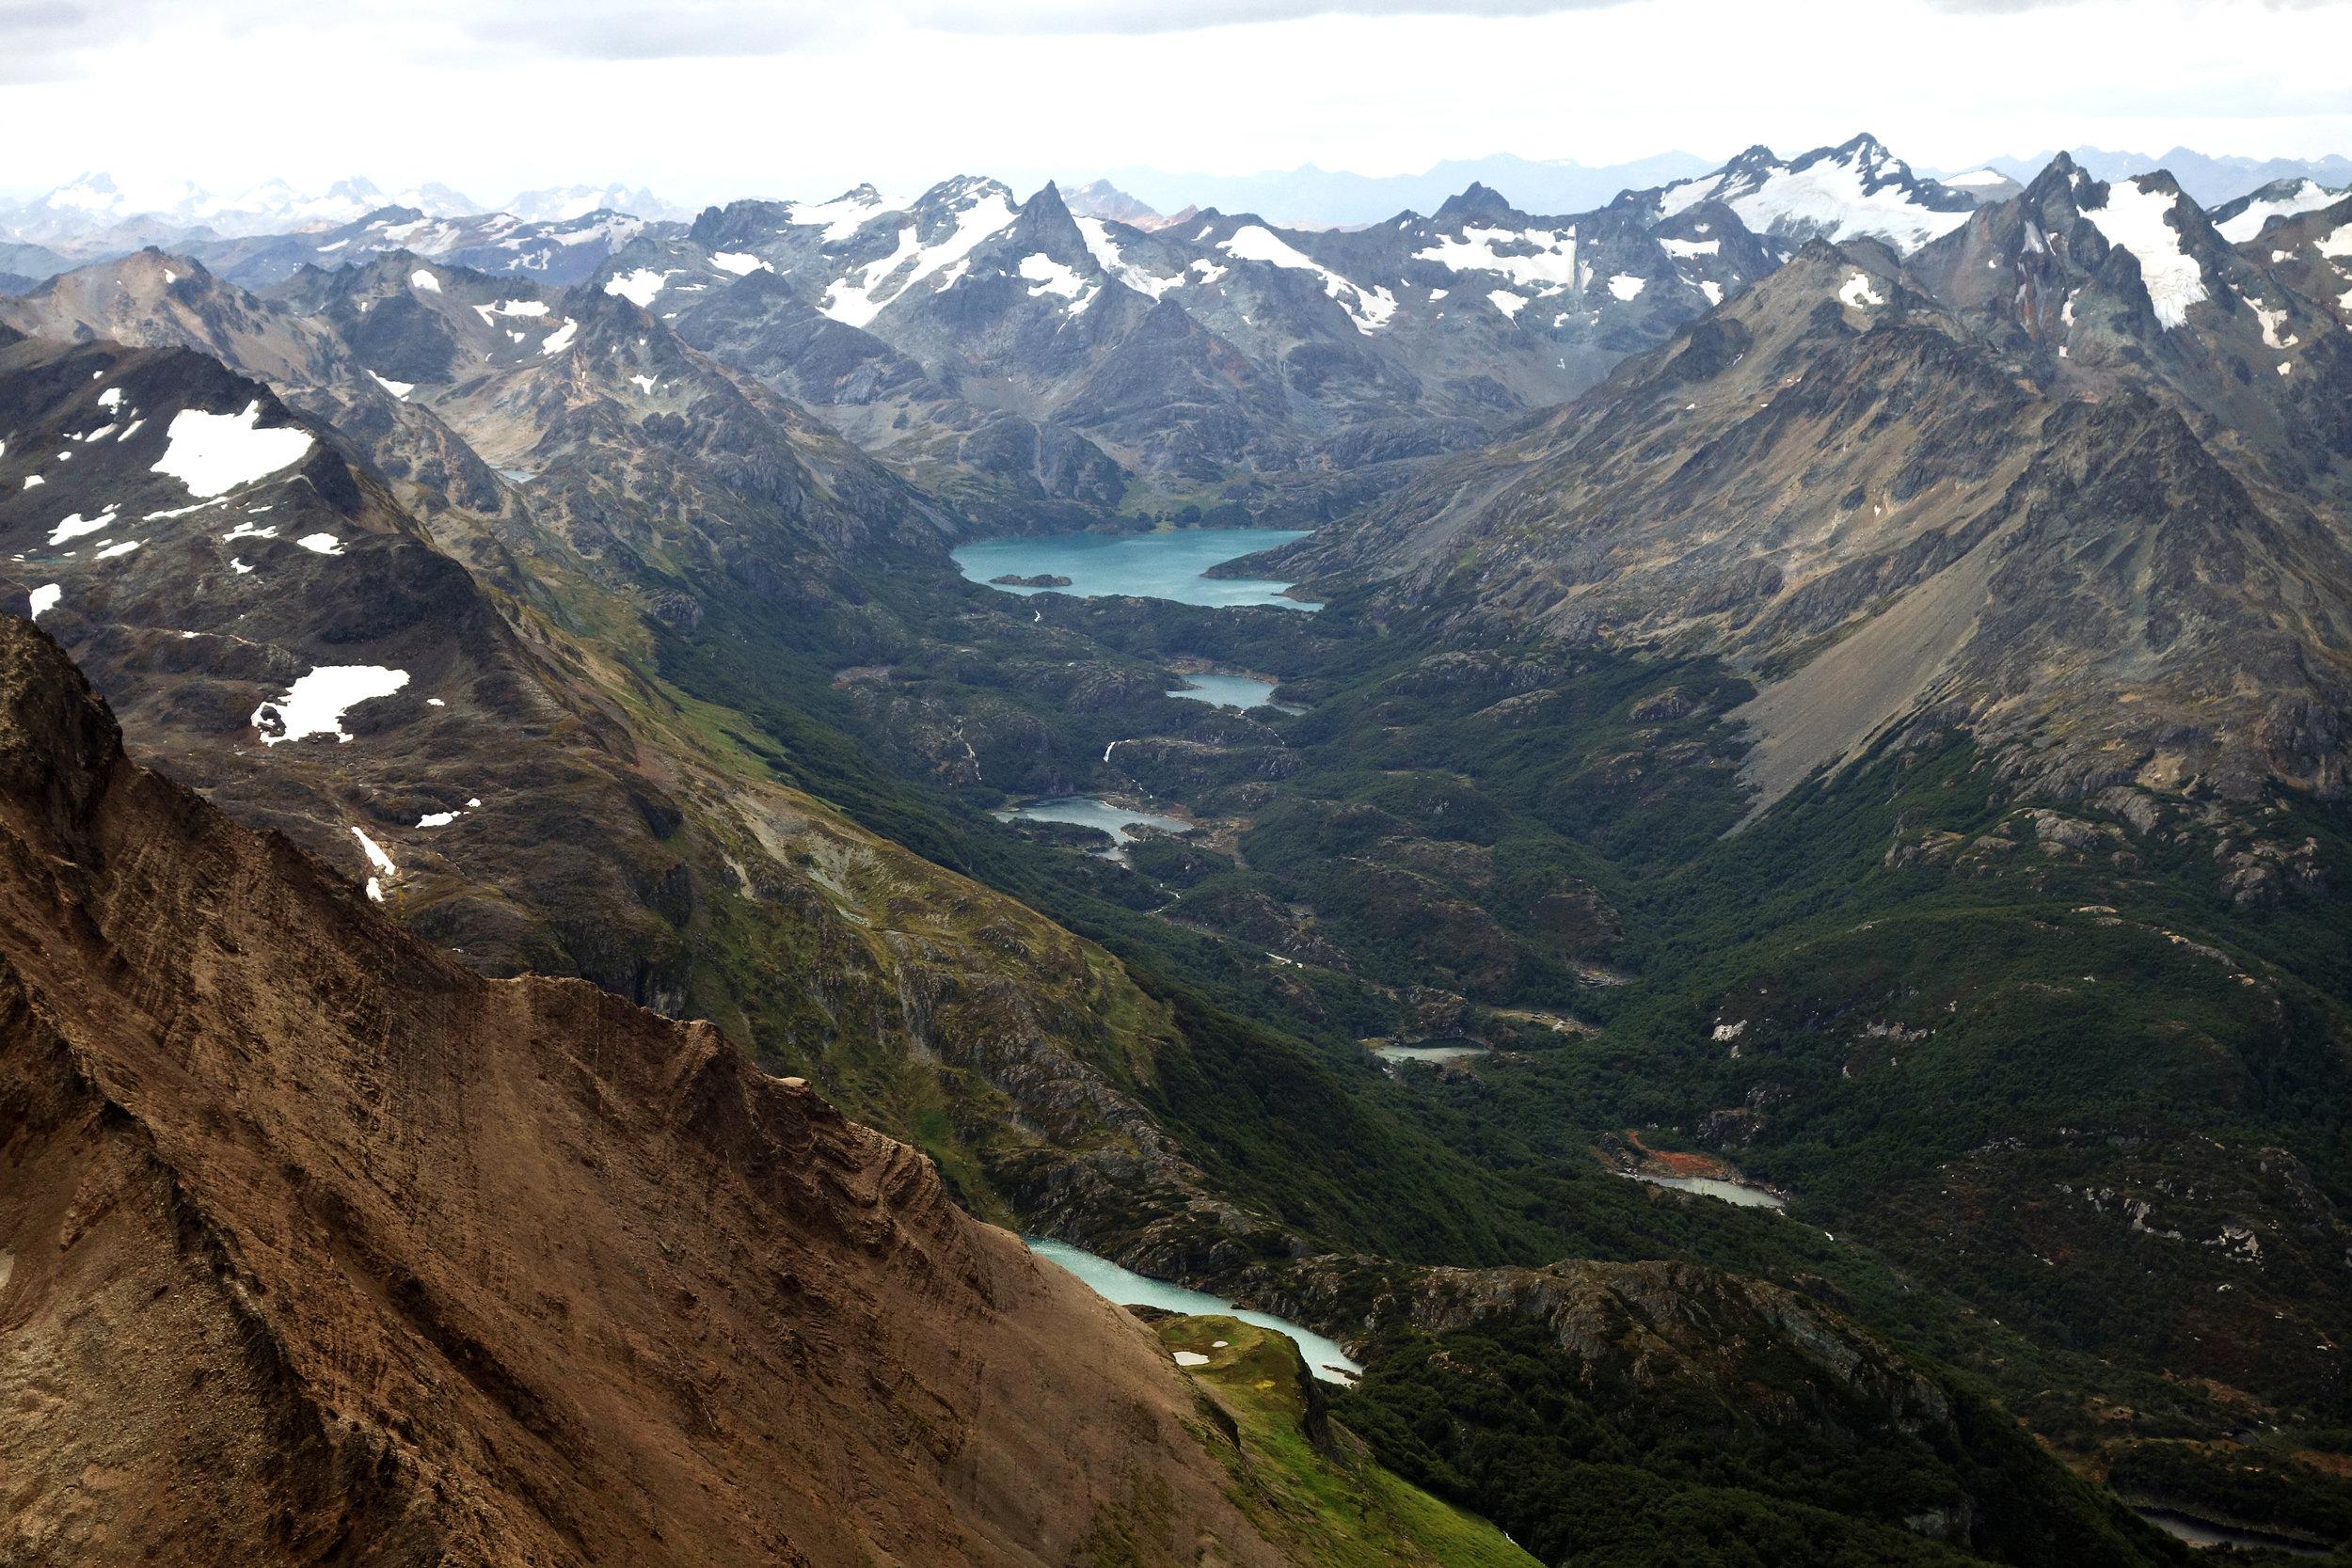 Looking northwest from the summit of Cerro Tonelli, Argentine Tierra del Fuego